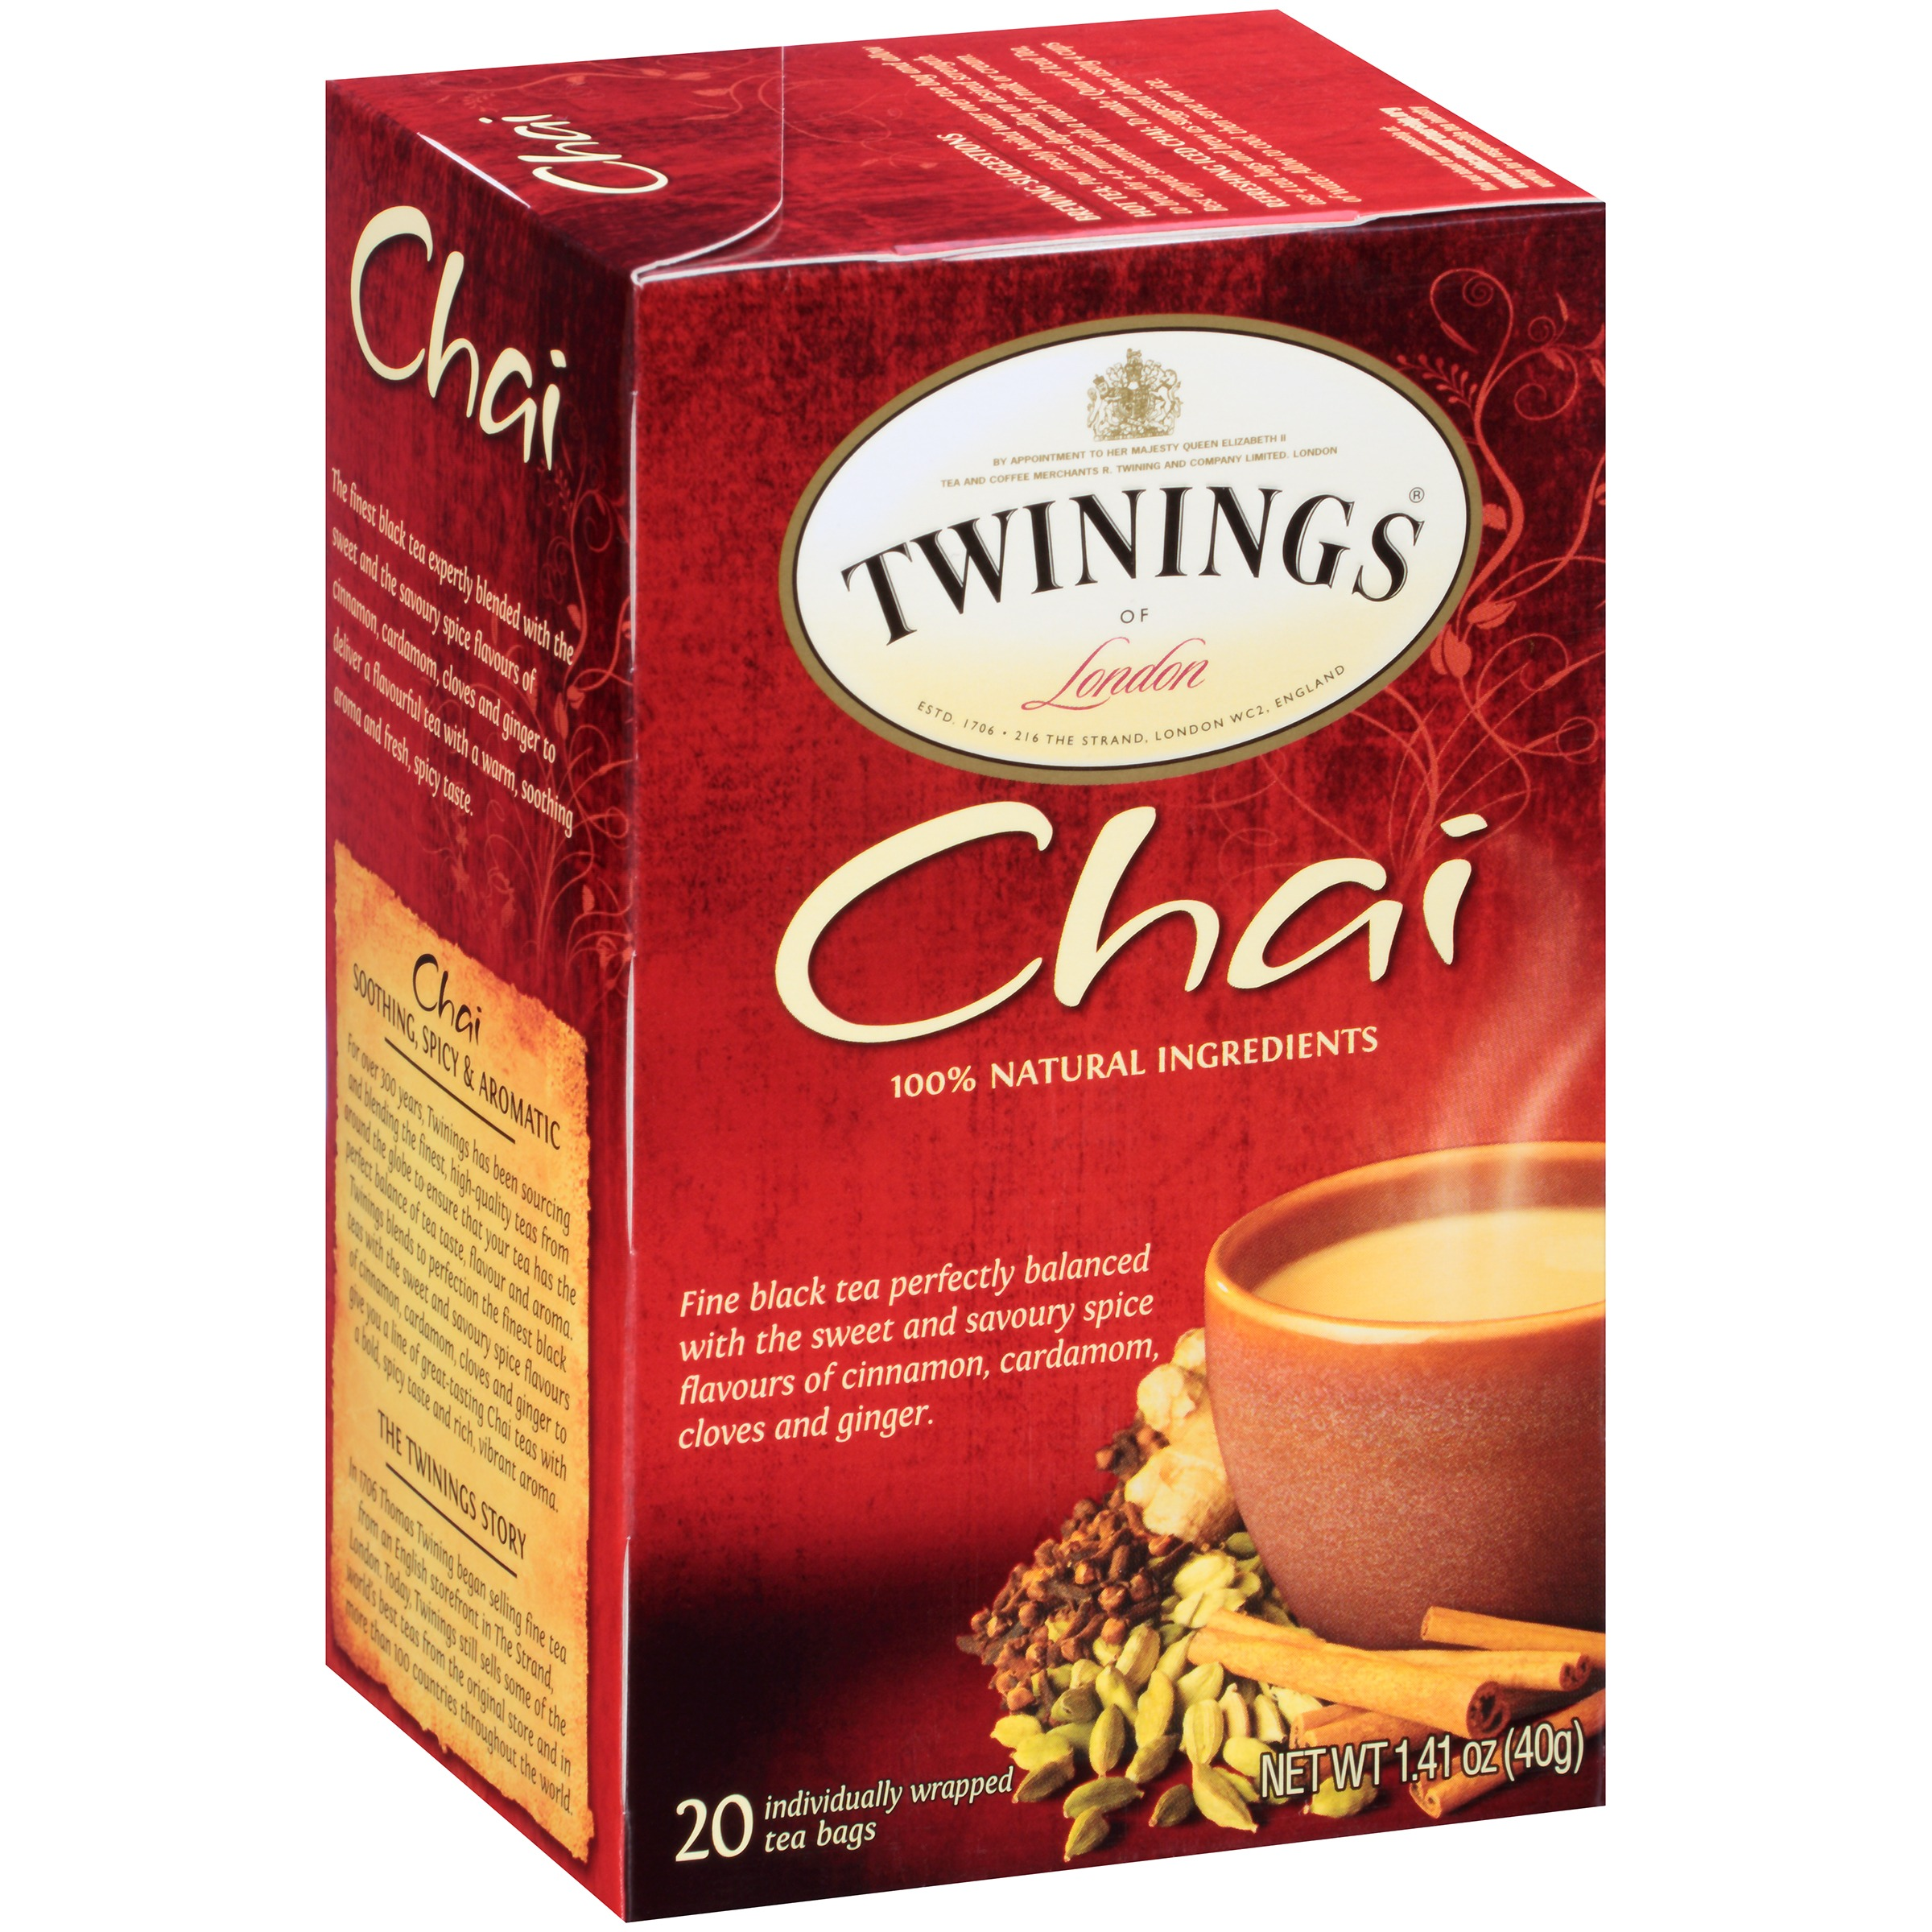 (4 Boxes) Twinings of London Chai Tea - 20 CT